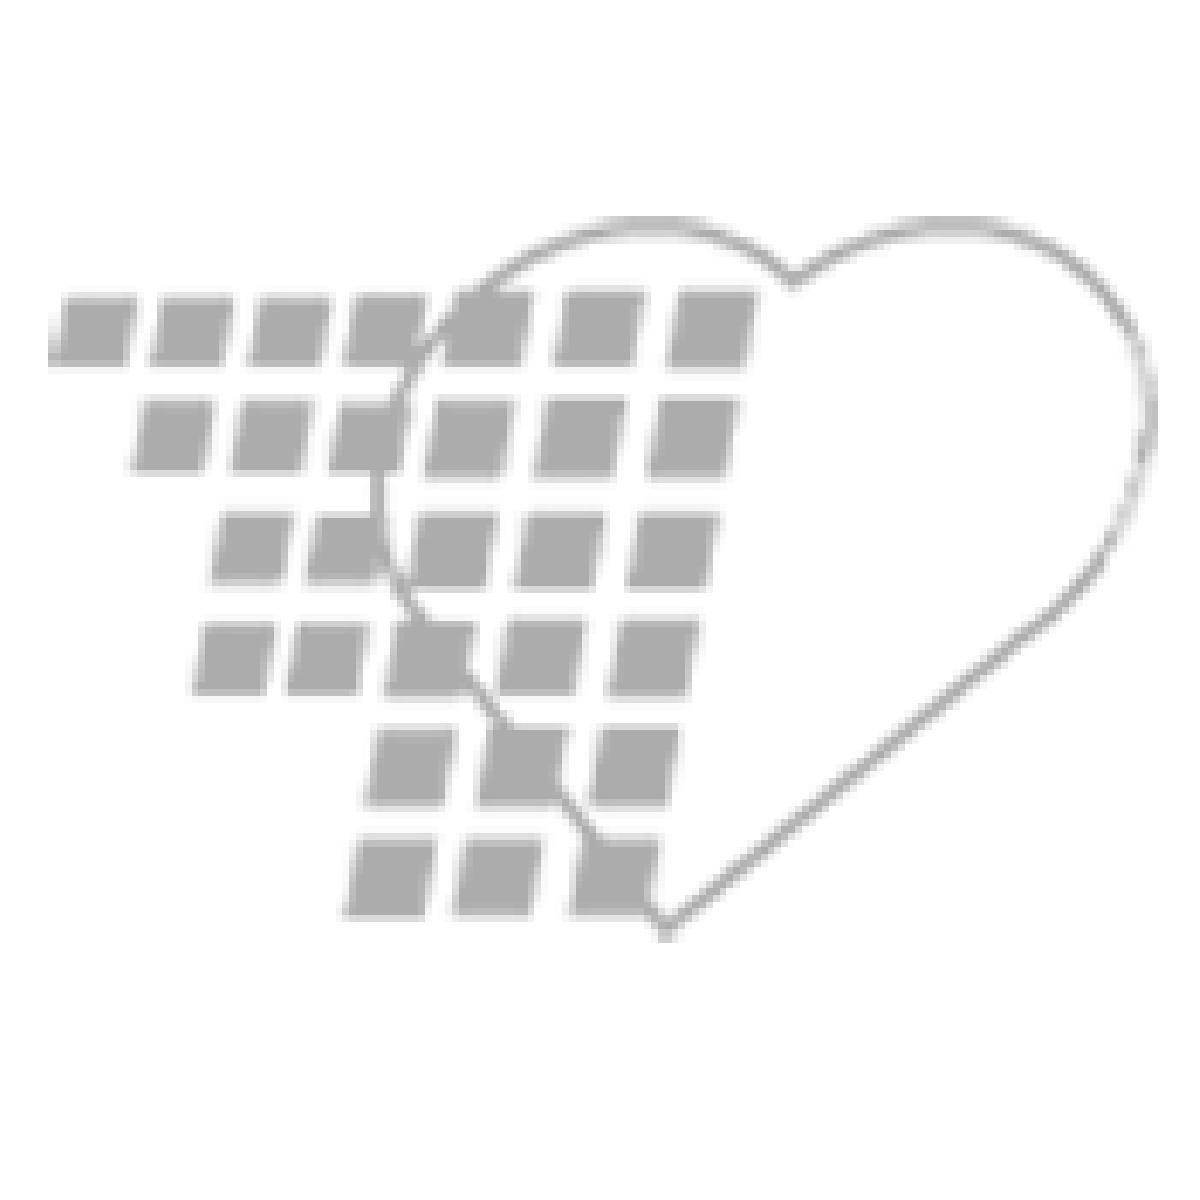 06-93-6922 Demo Dose® Ondansetrn Zofrn 2mg mL 2mL